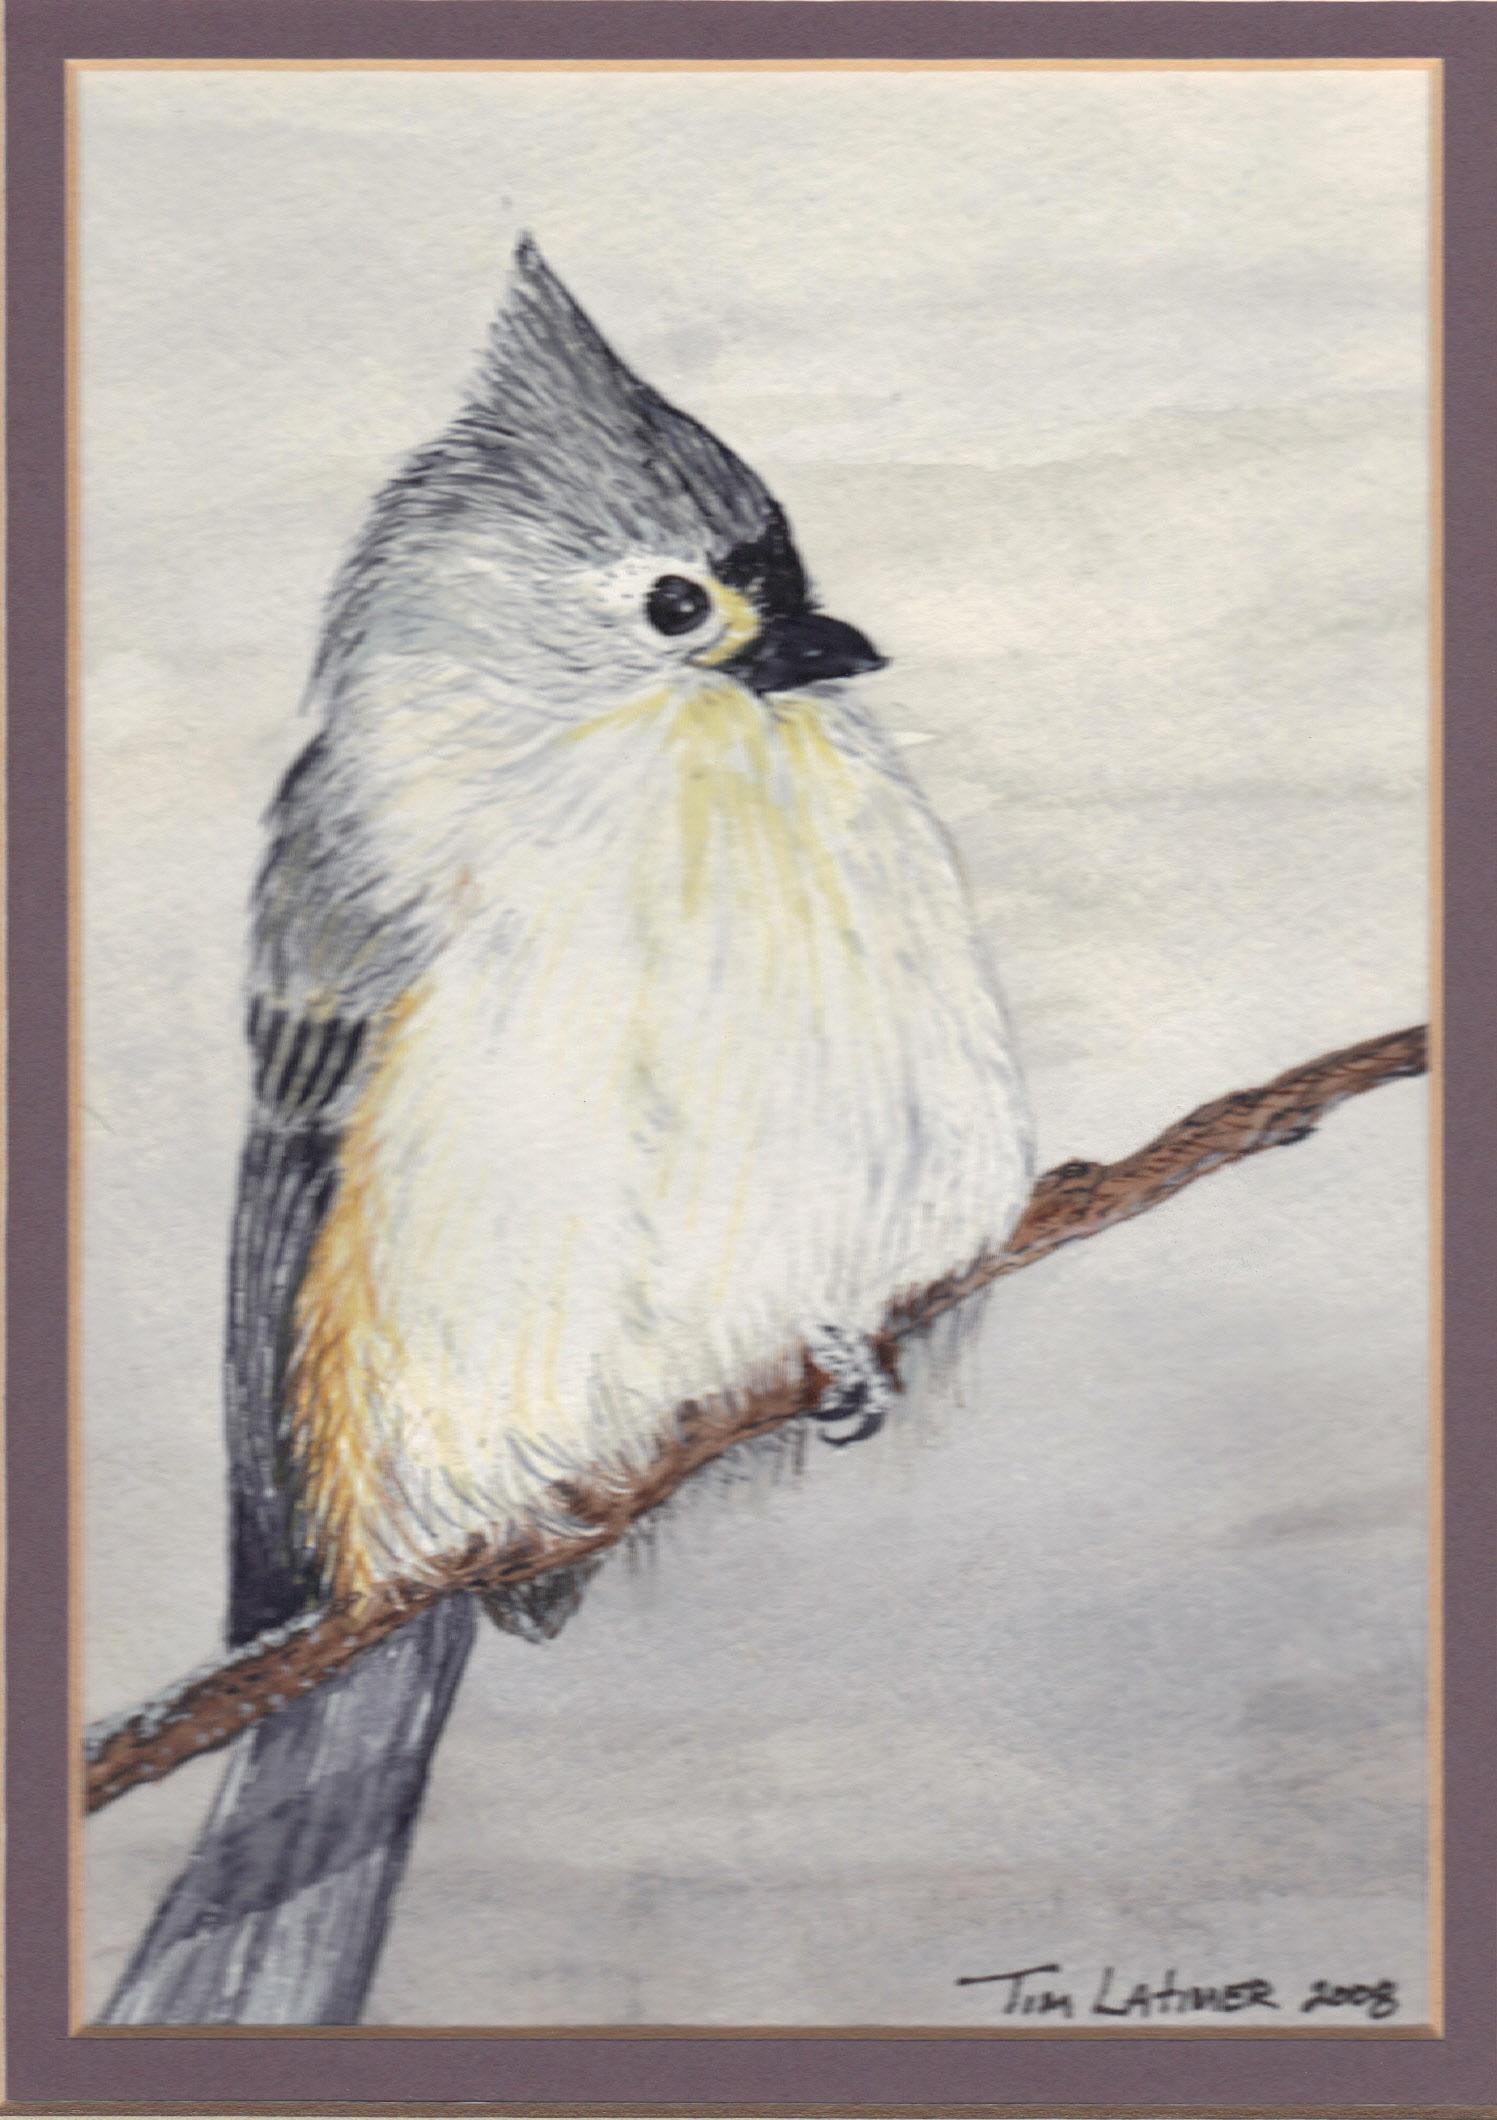 applique bird quilt | Tim Latimer - Quilts etc